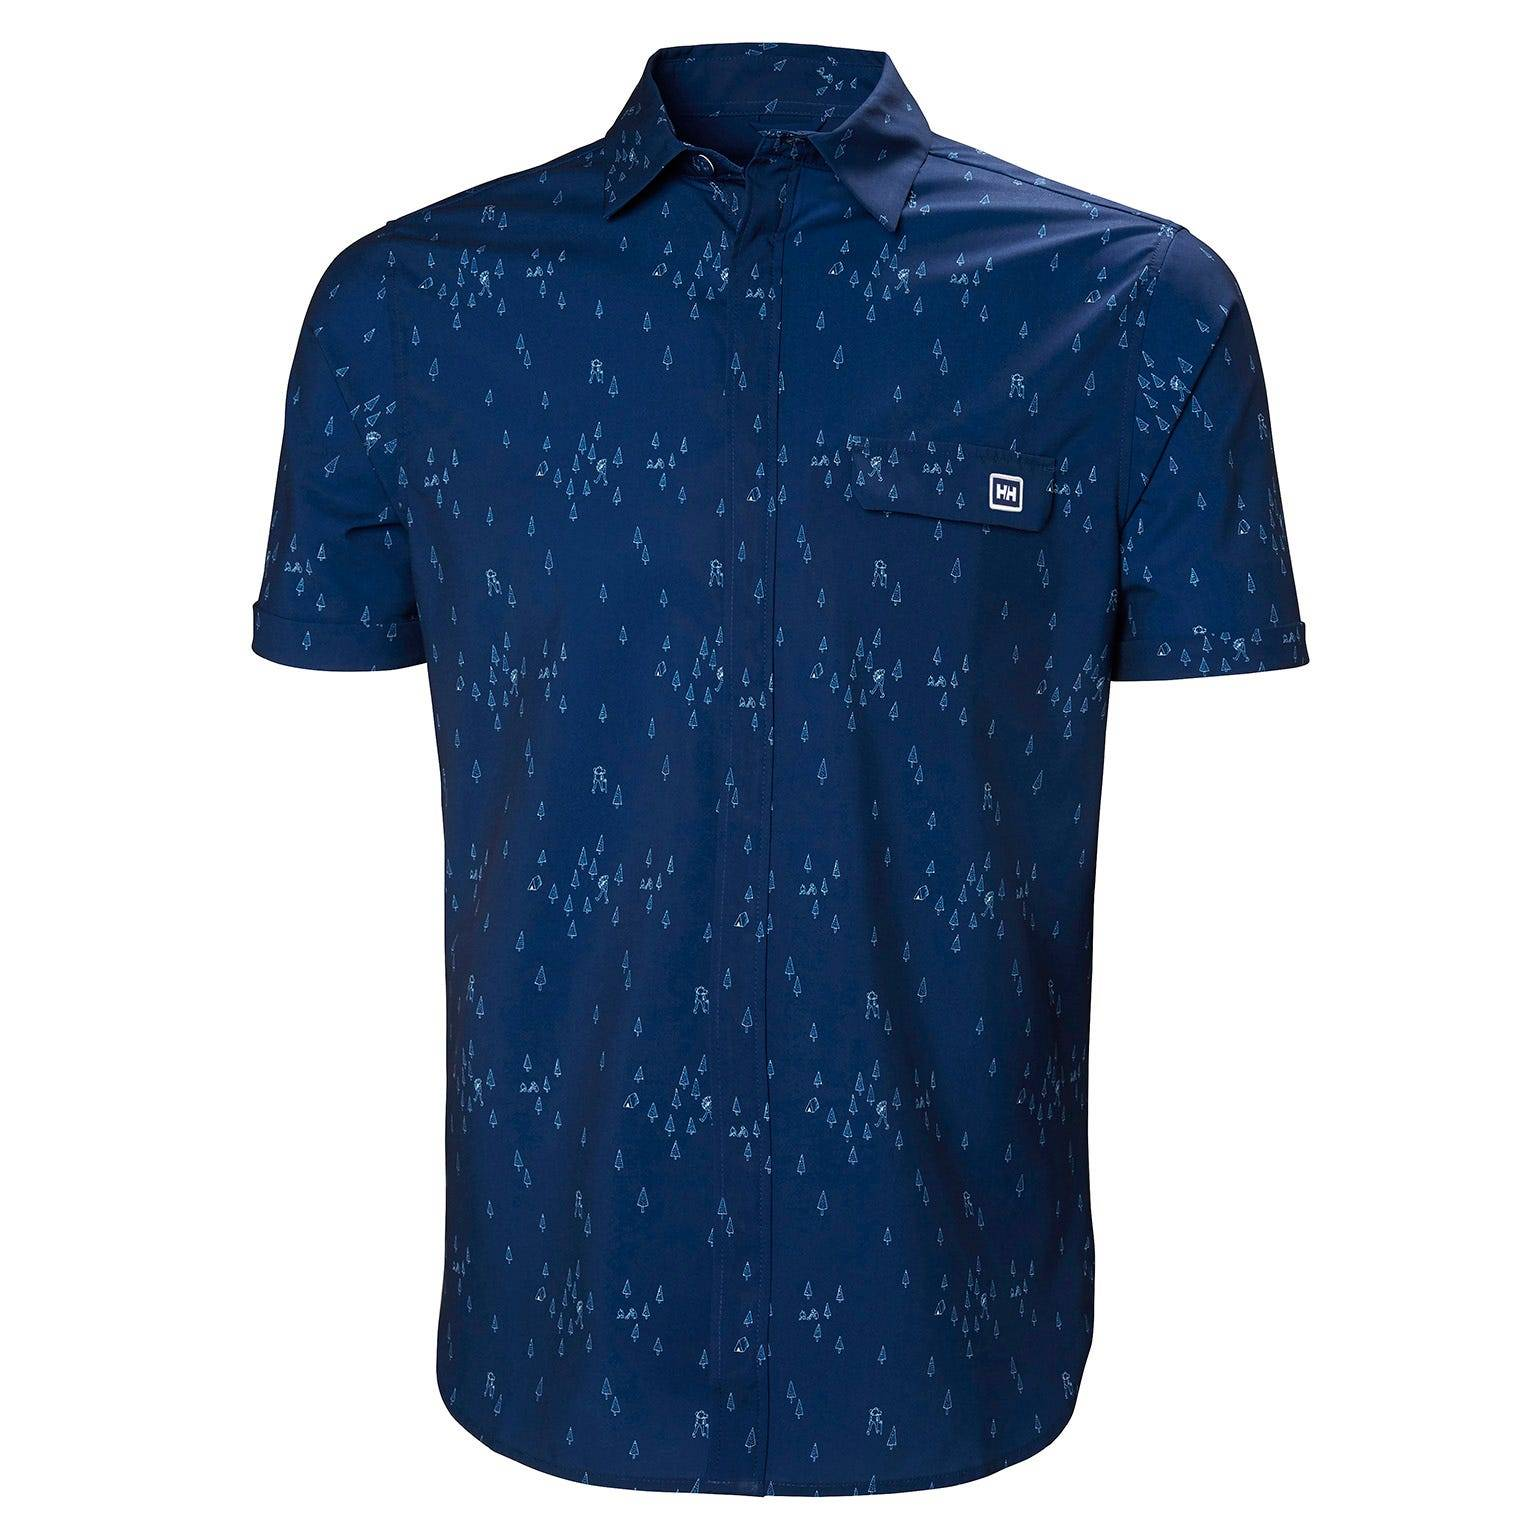 Helly Hansen Oya Shirt Blue M